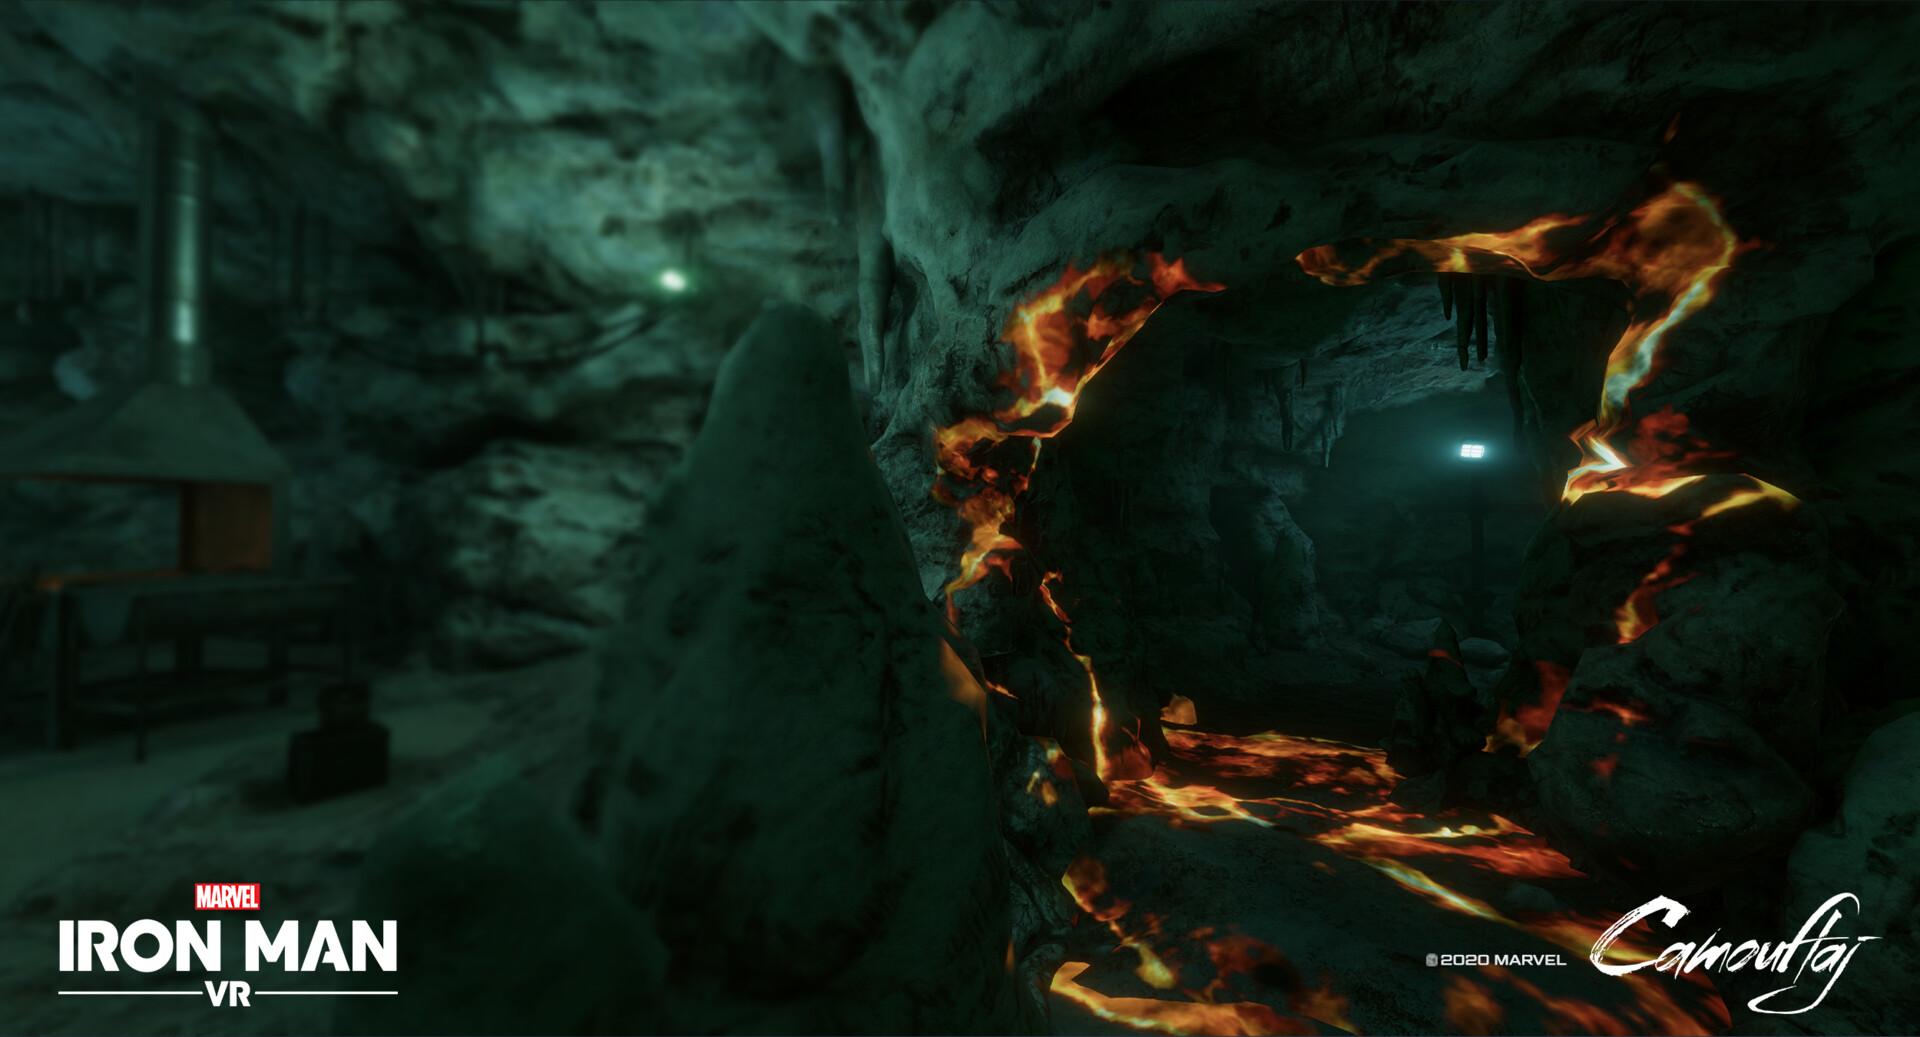 Cave Blasted Entrance Model. VFX by Brandan Vanderpool.